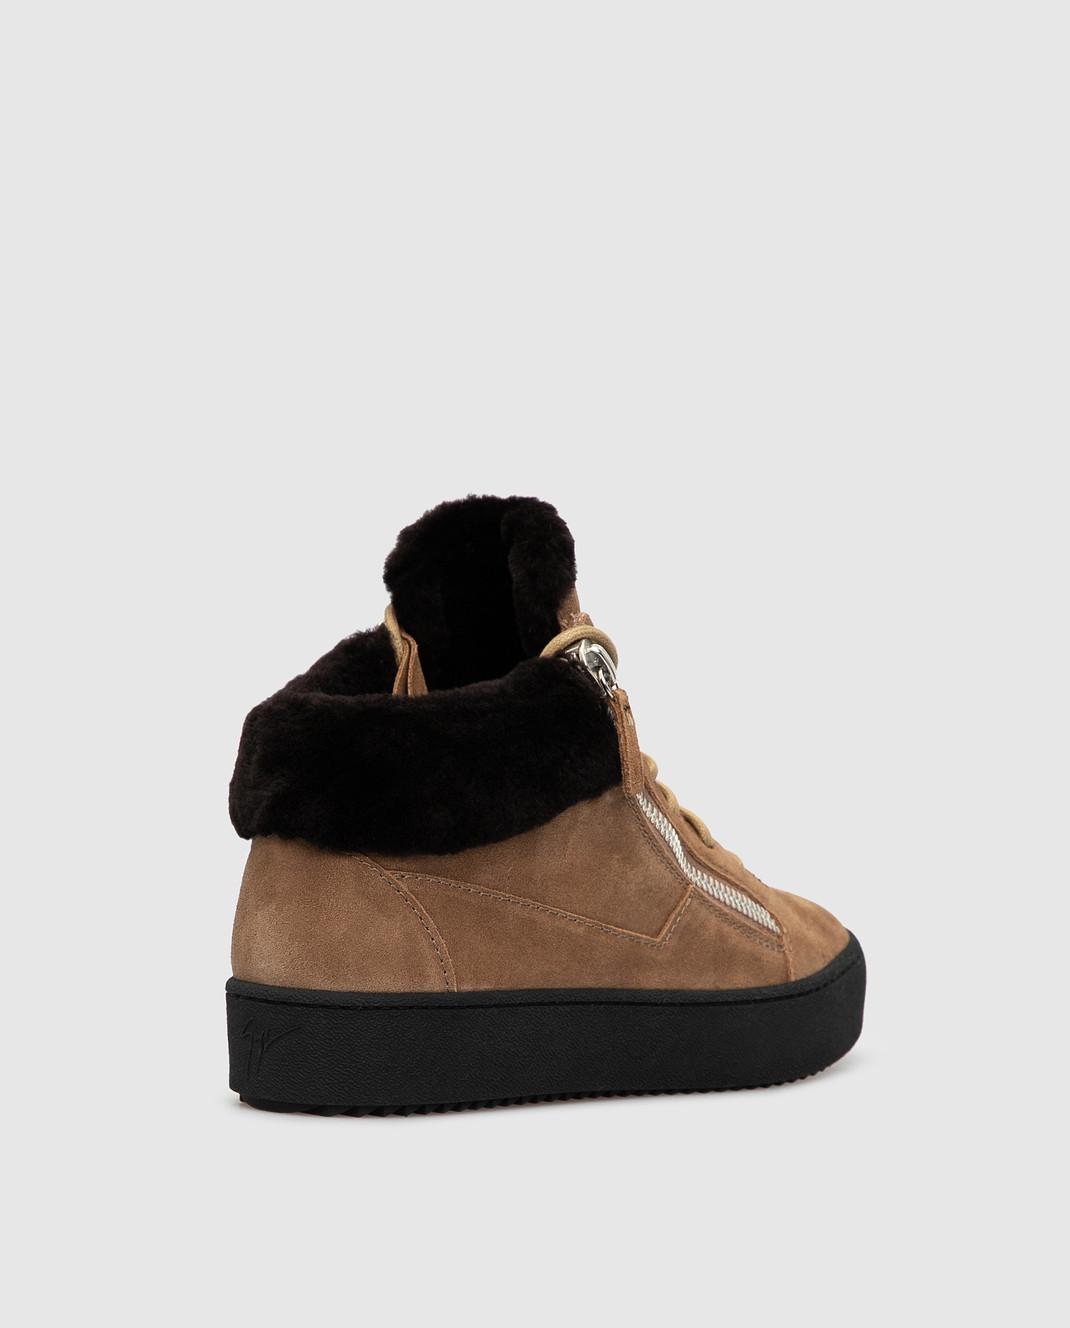 Giuseppe Zanotti Бежевые замшевые ботинки изображение 4